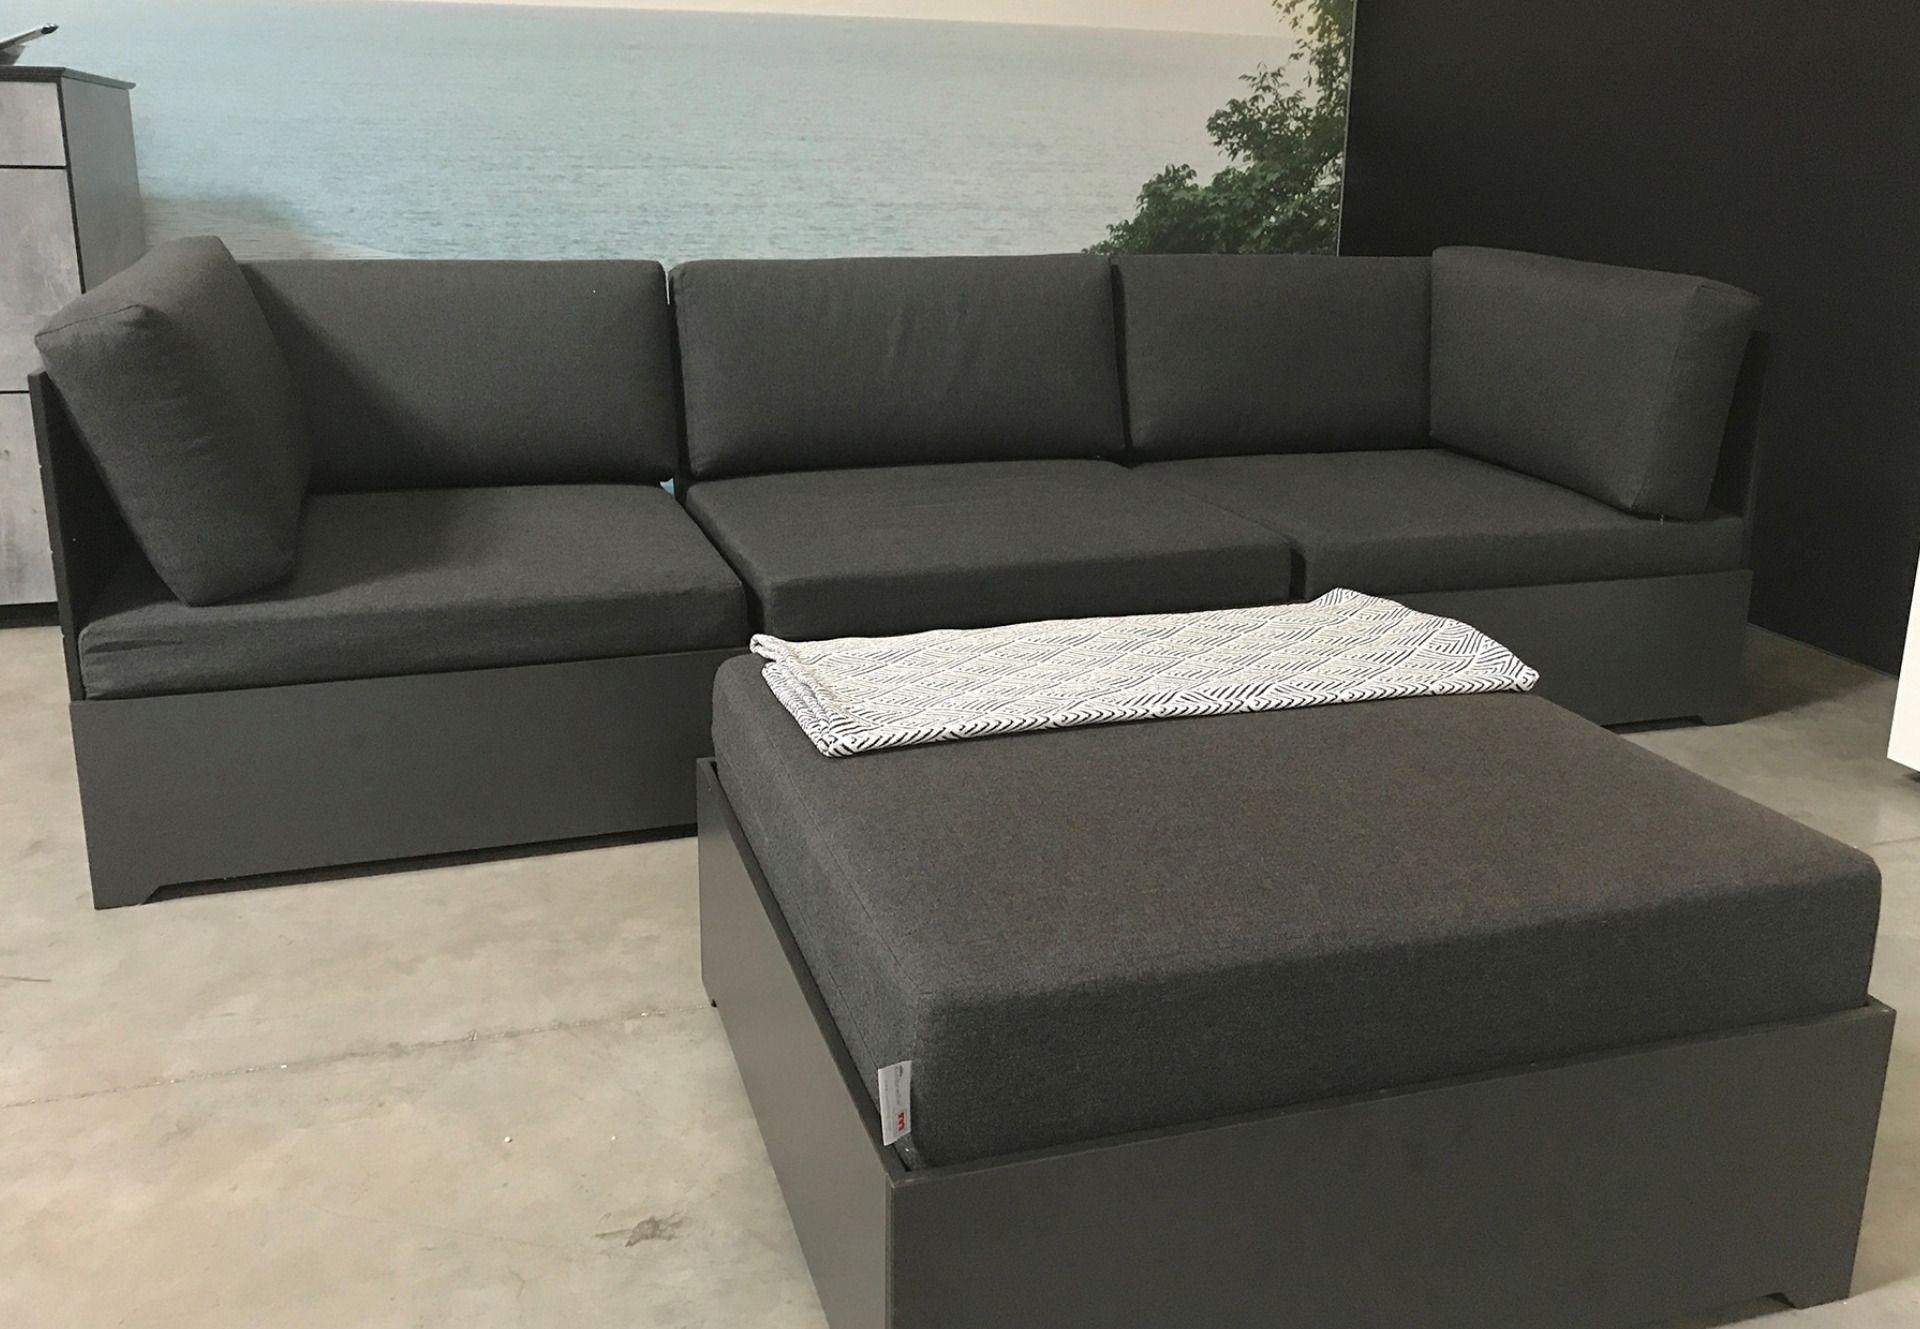 Gartenlounge In Anthrazit Lounge Lounge Mobel Gartensofa